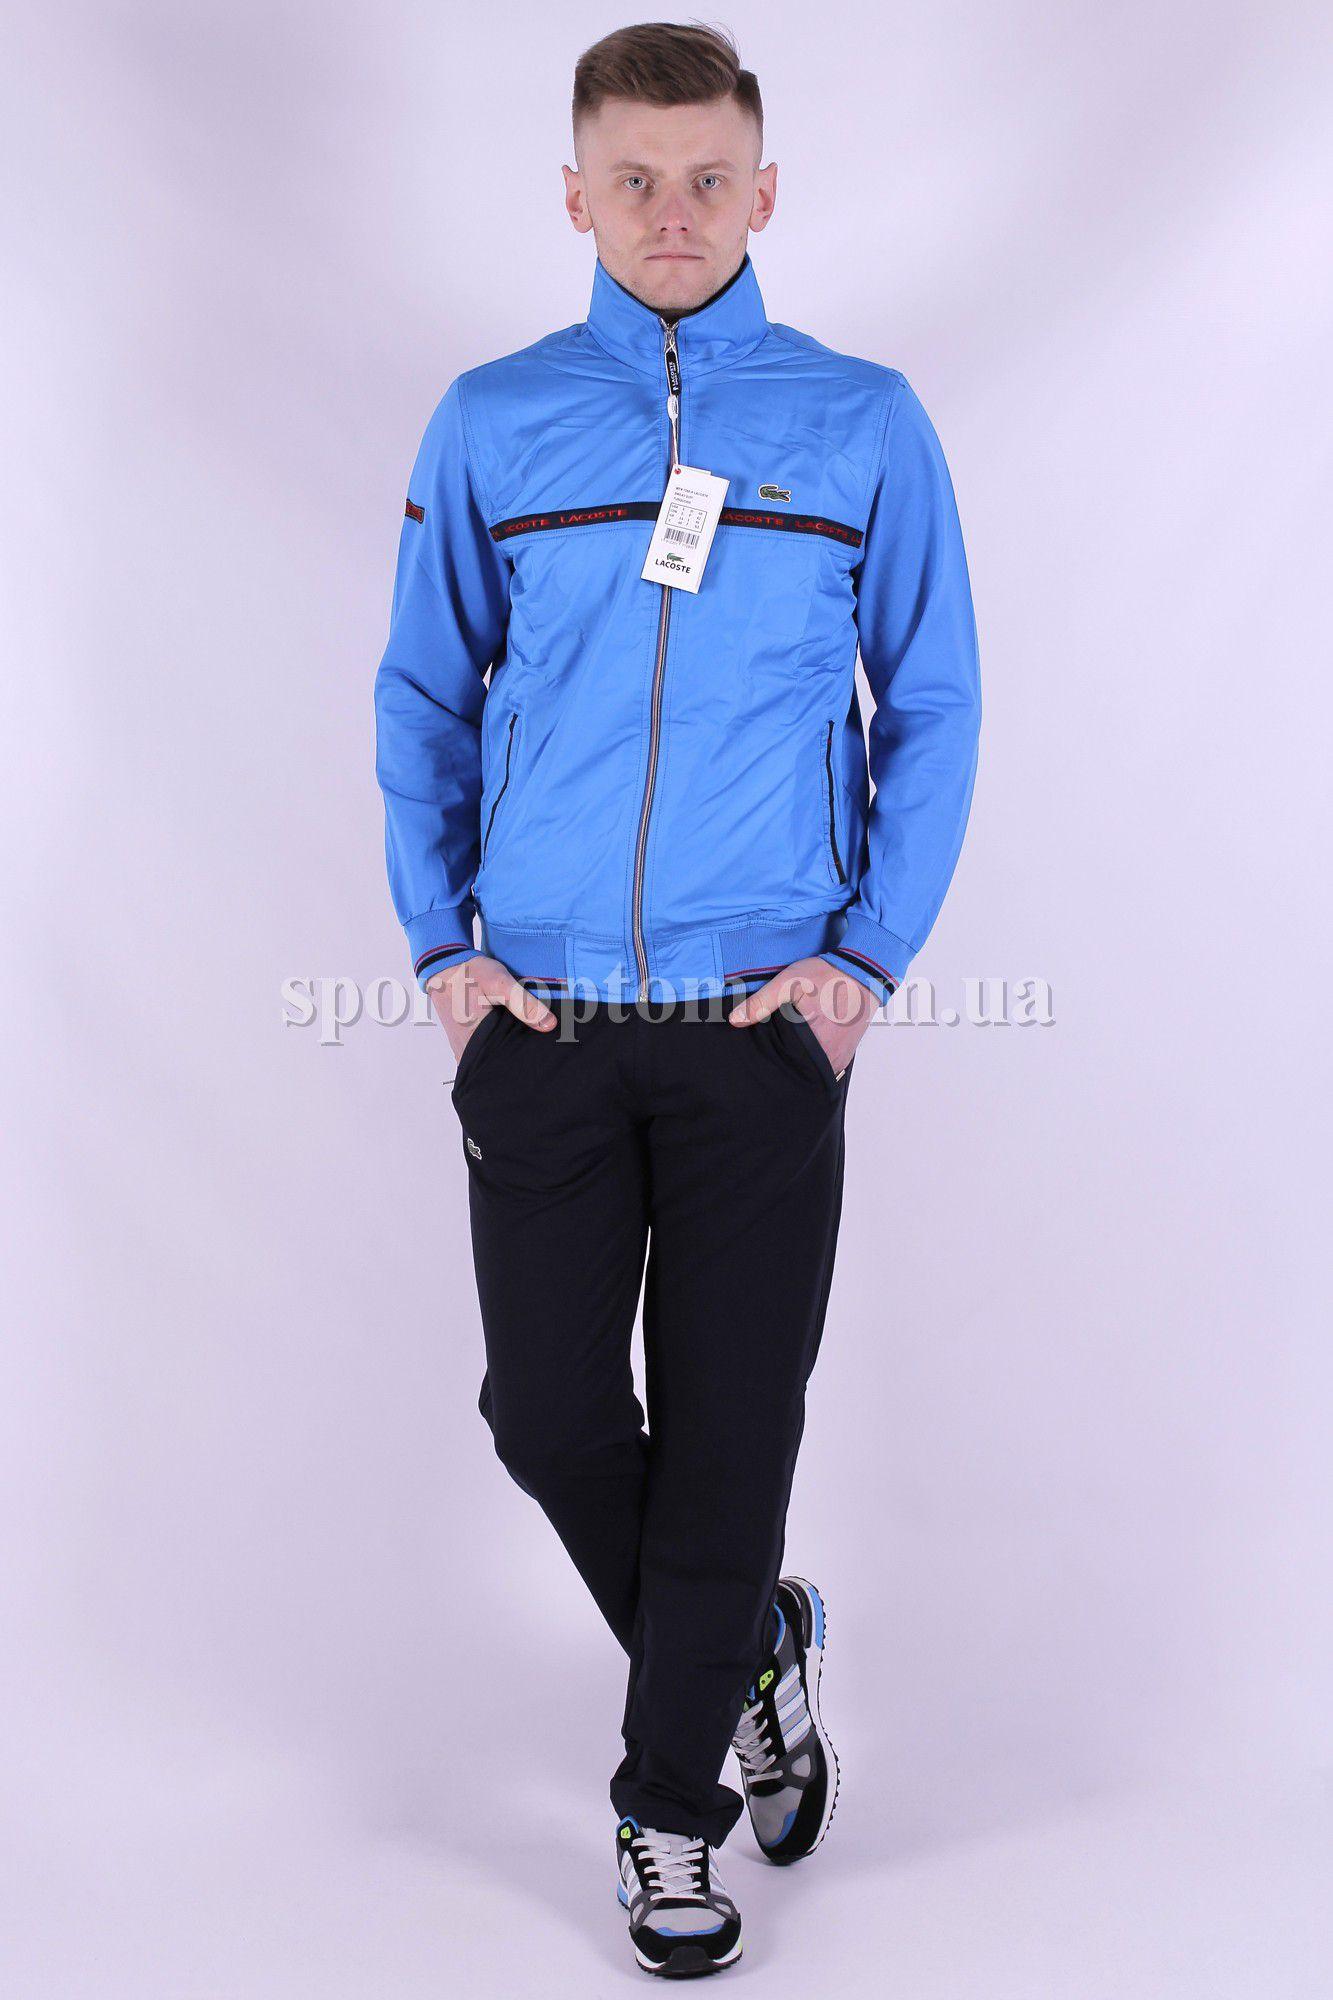 Купить оптом Мужской спортивный костюм LACOSTE 7280 турецкого ... f1fb2654b17